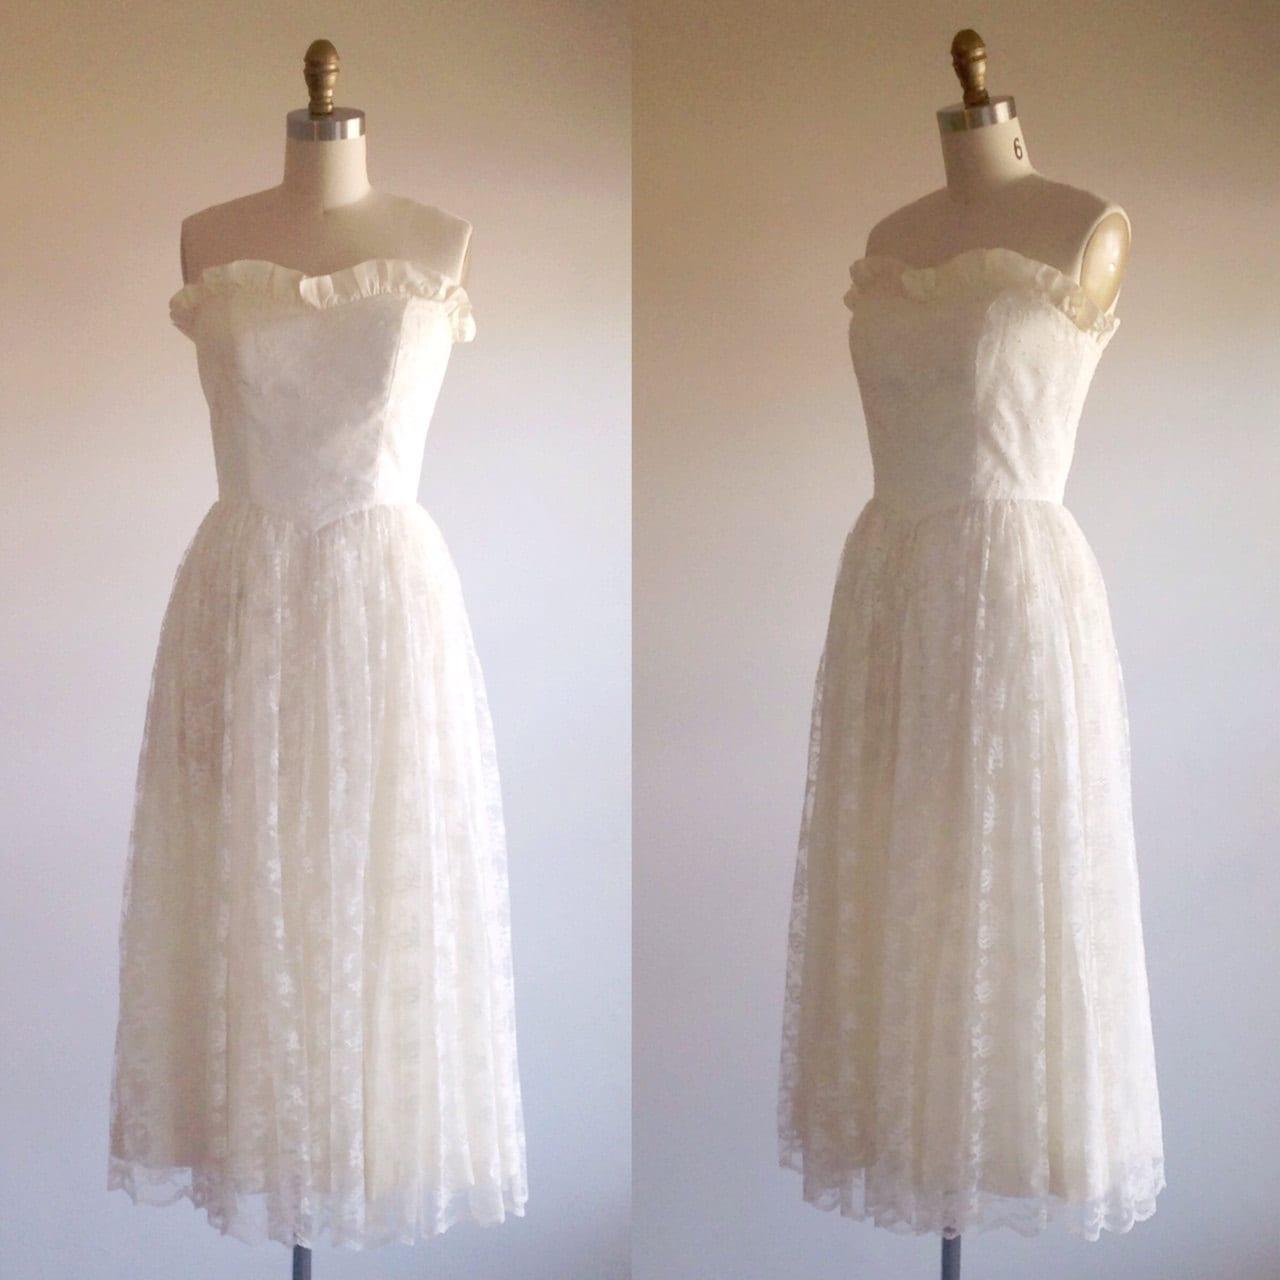 Lace Wedding Dress Simple Wedding Dress Ivory Wedding Dress